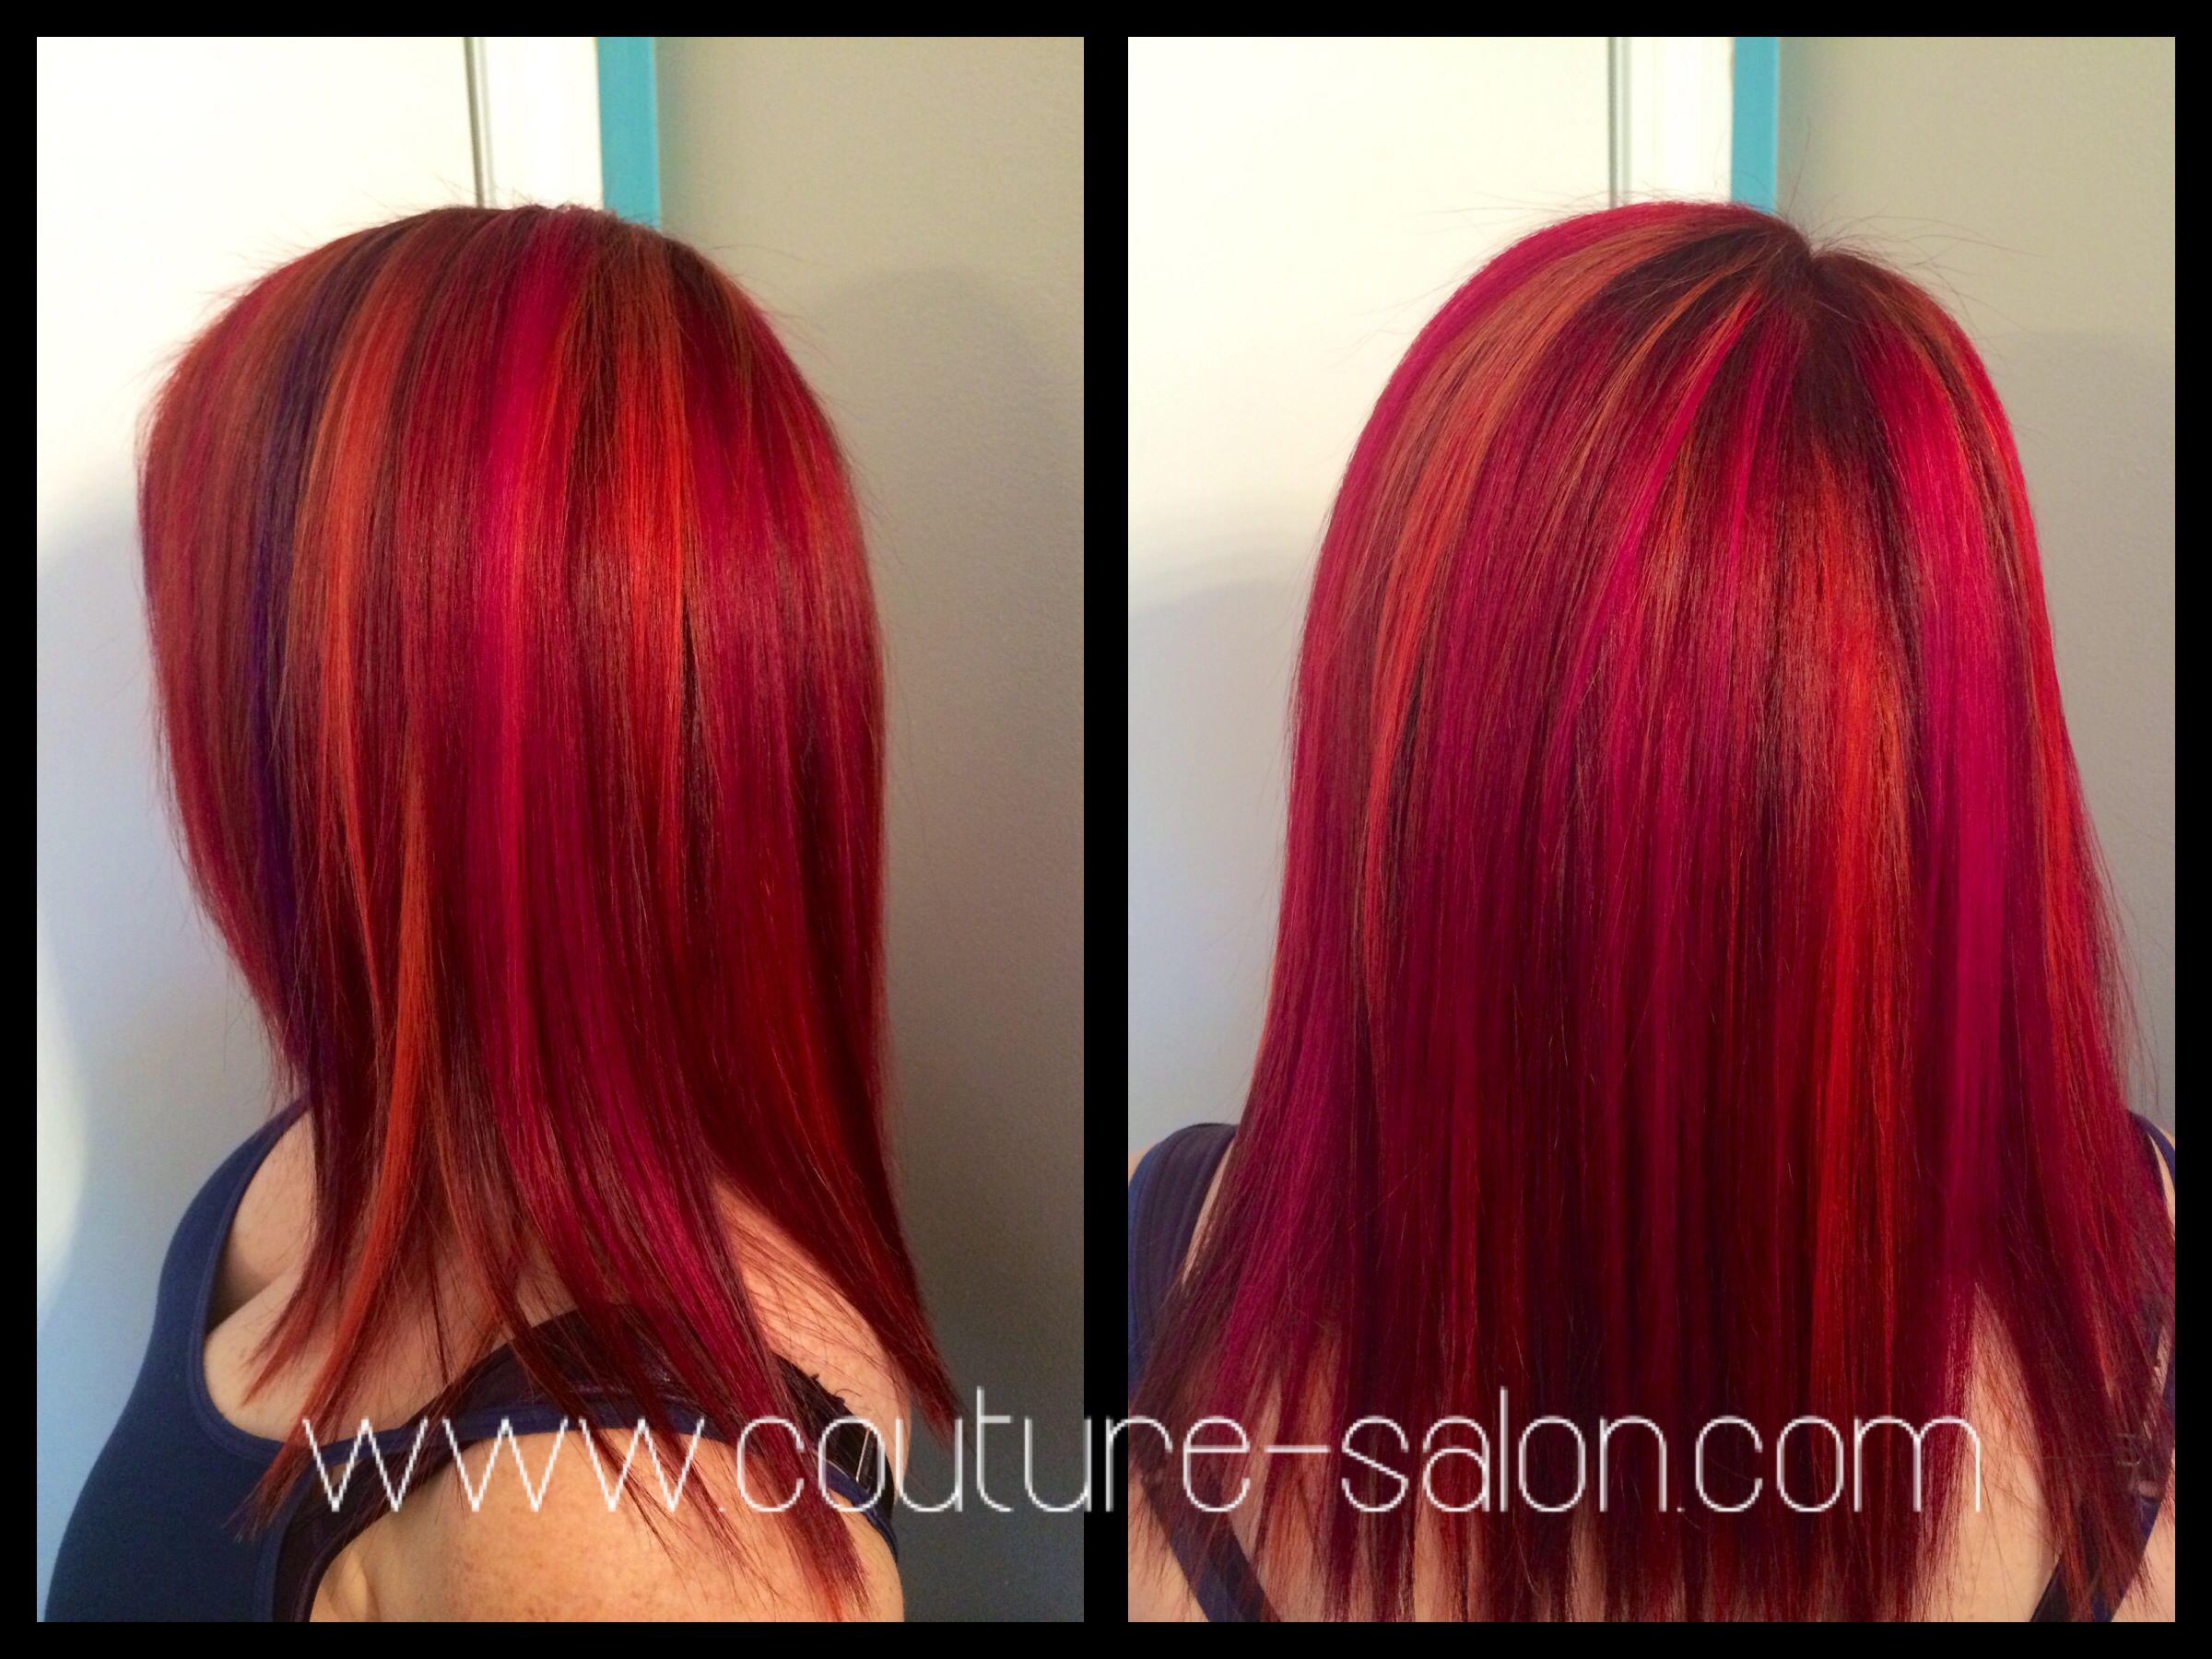 Couture salon magma copper high lights hot pink also de beste bildene for wella hair colors coloring og rh pinterest